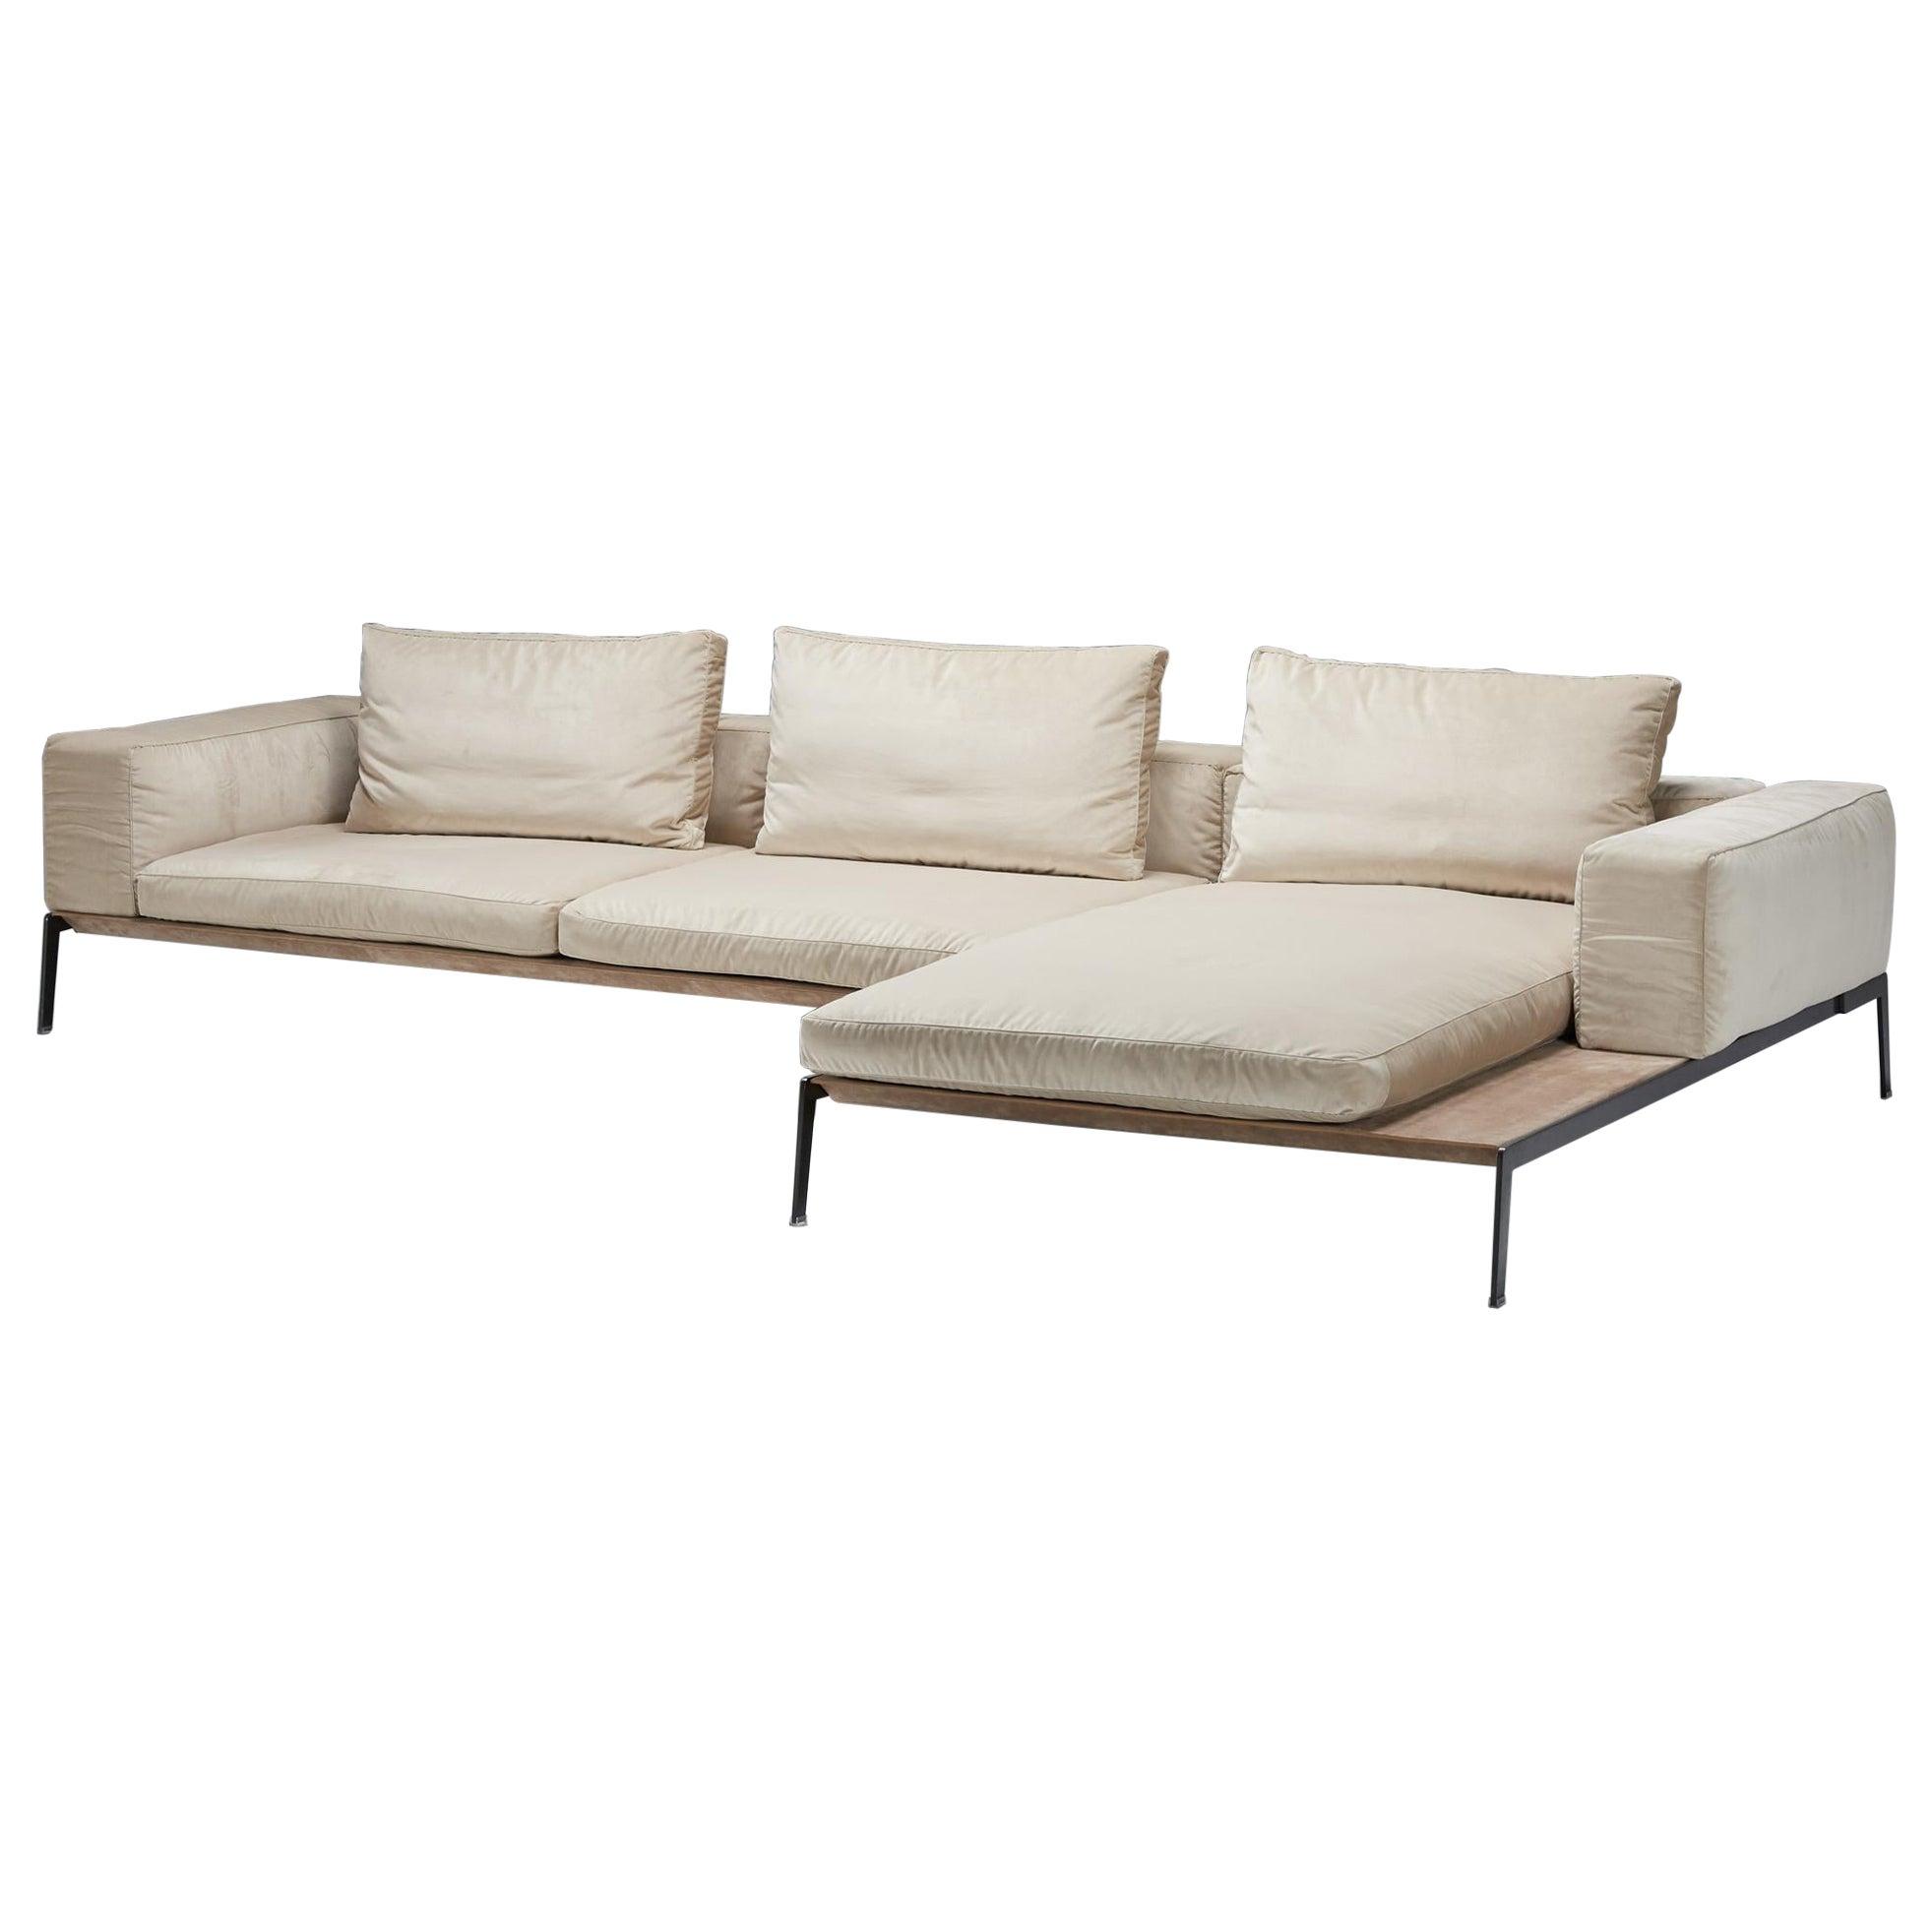 Antonio Citterio for Flexform, Lifesteel White Three Seater Sofa